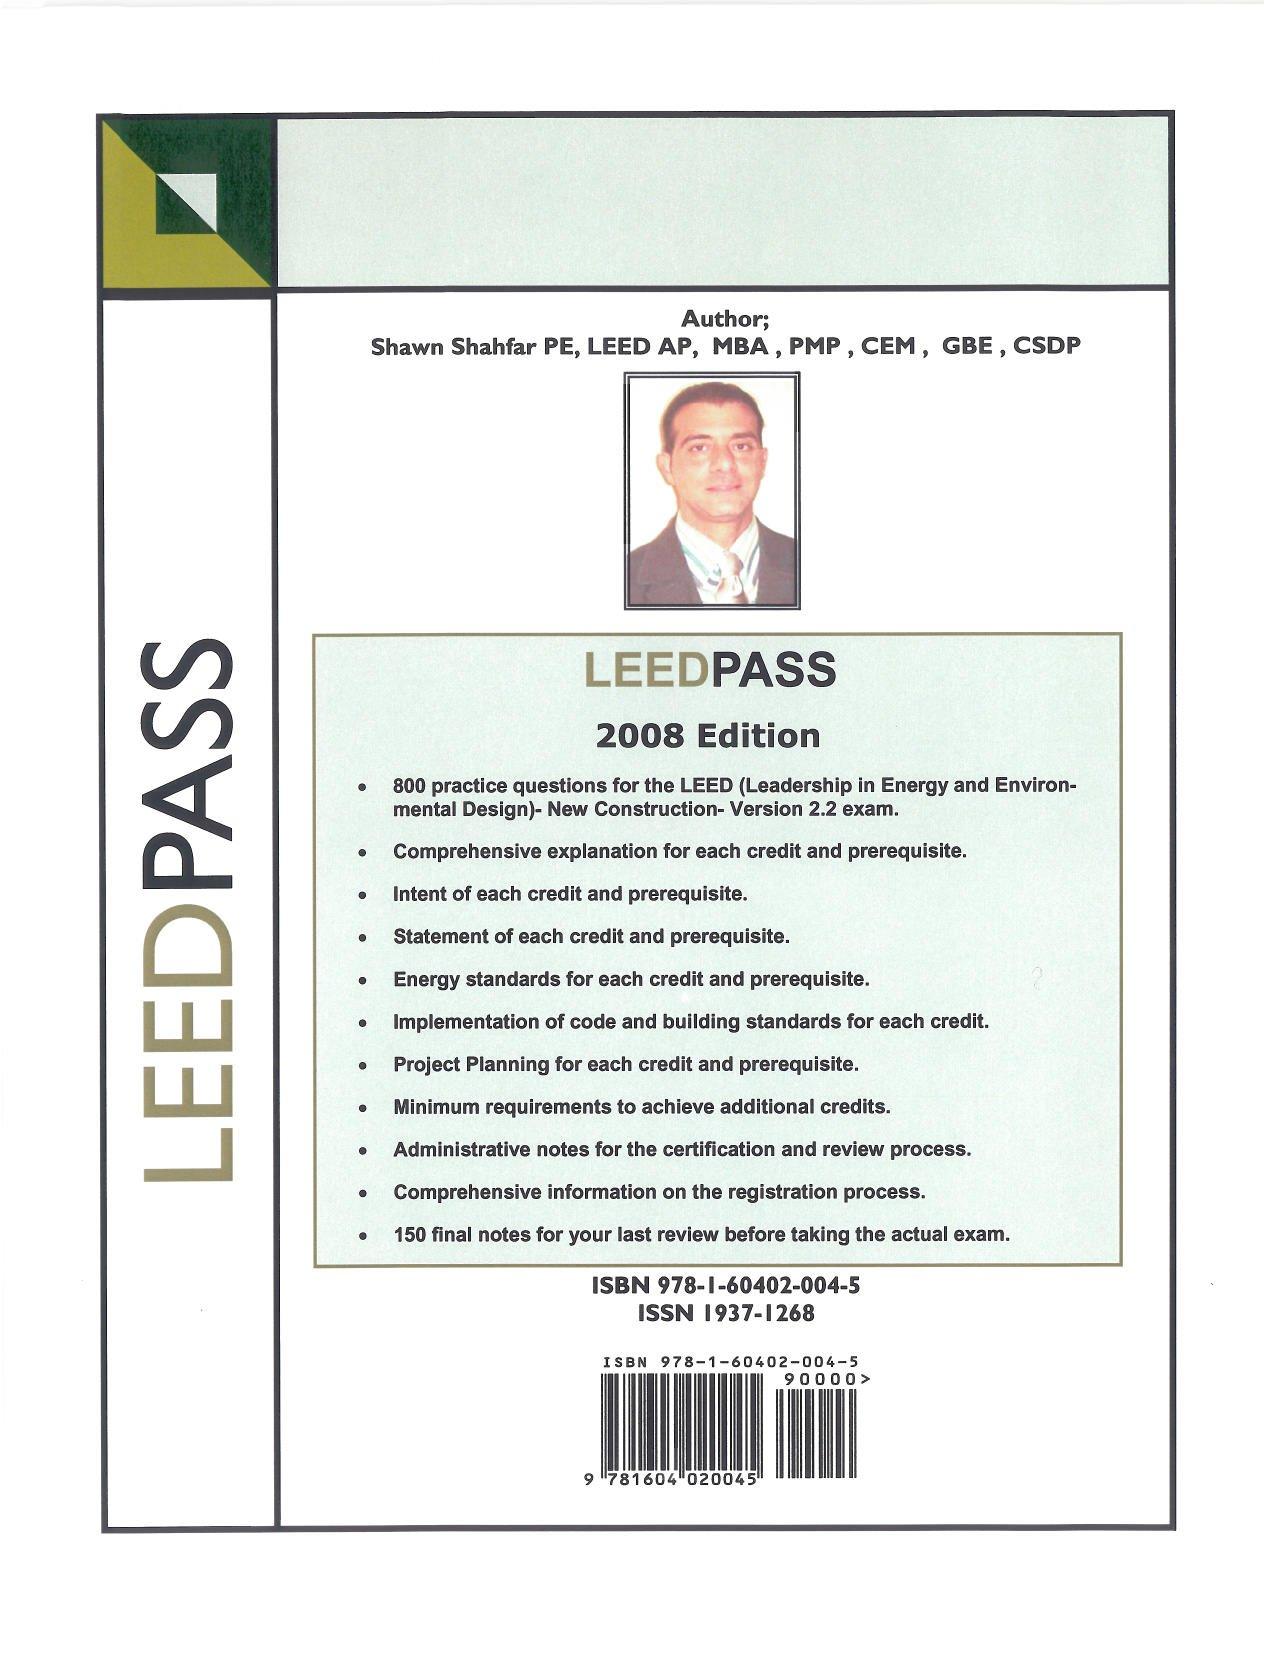 Leedpass Comprehensive Study Material For Leed Ap Exam 800 Exam